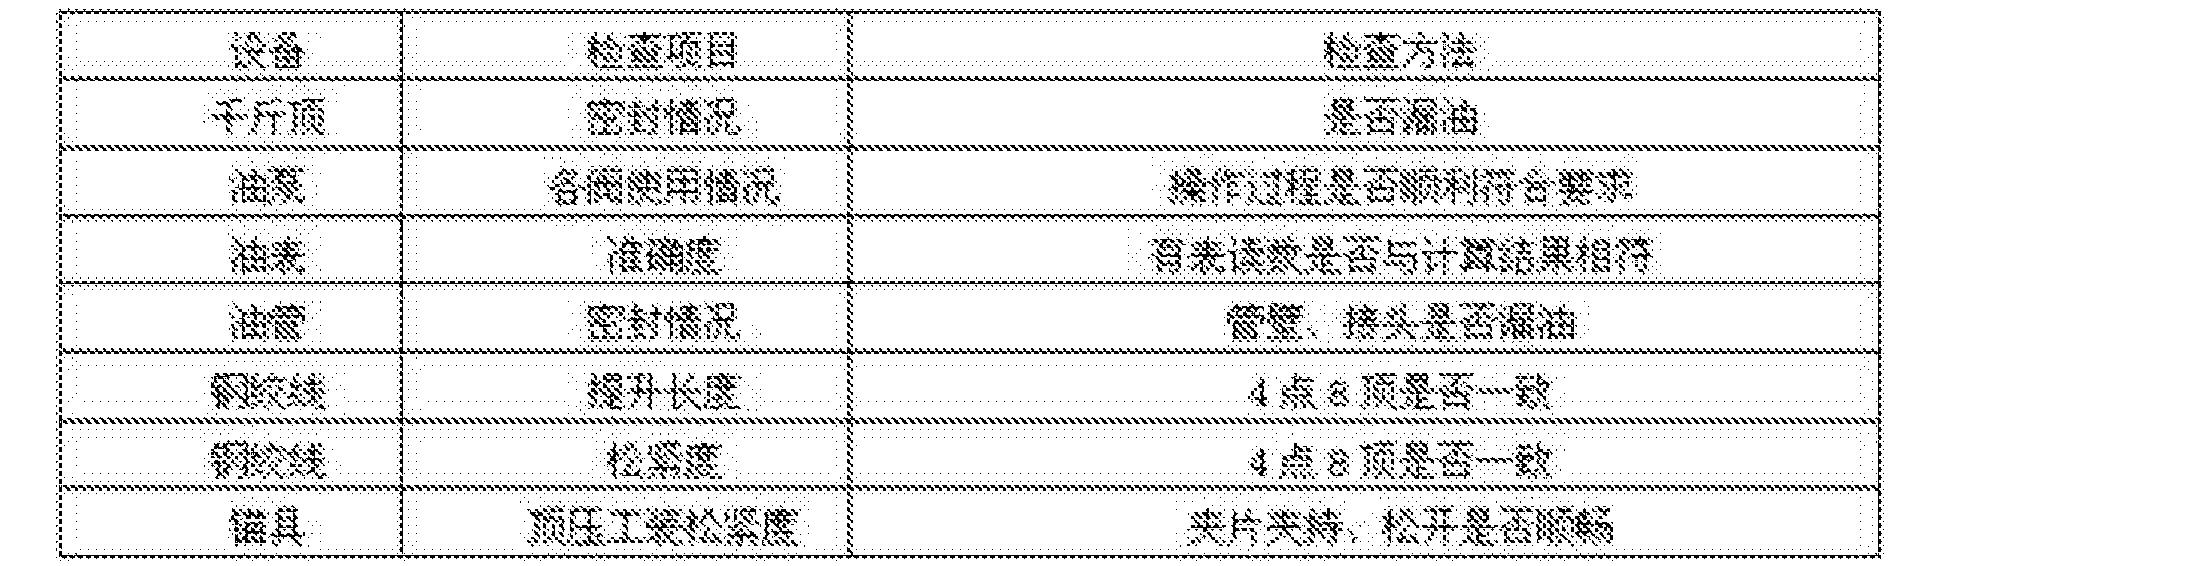 Figure CN205558304UD00101